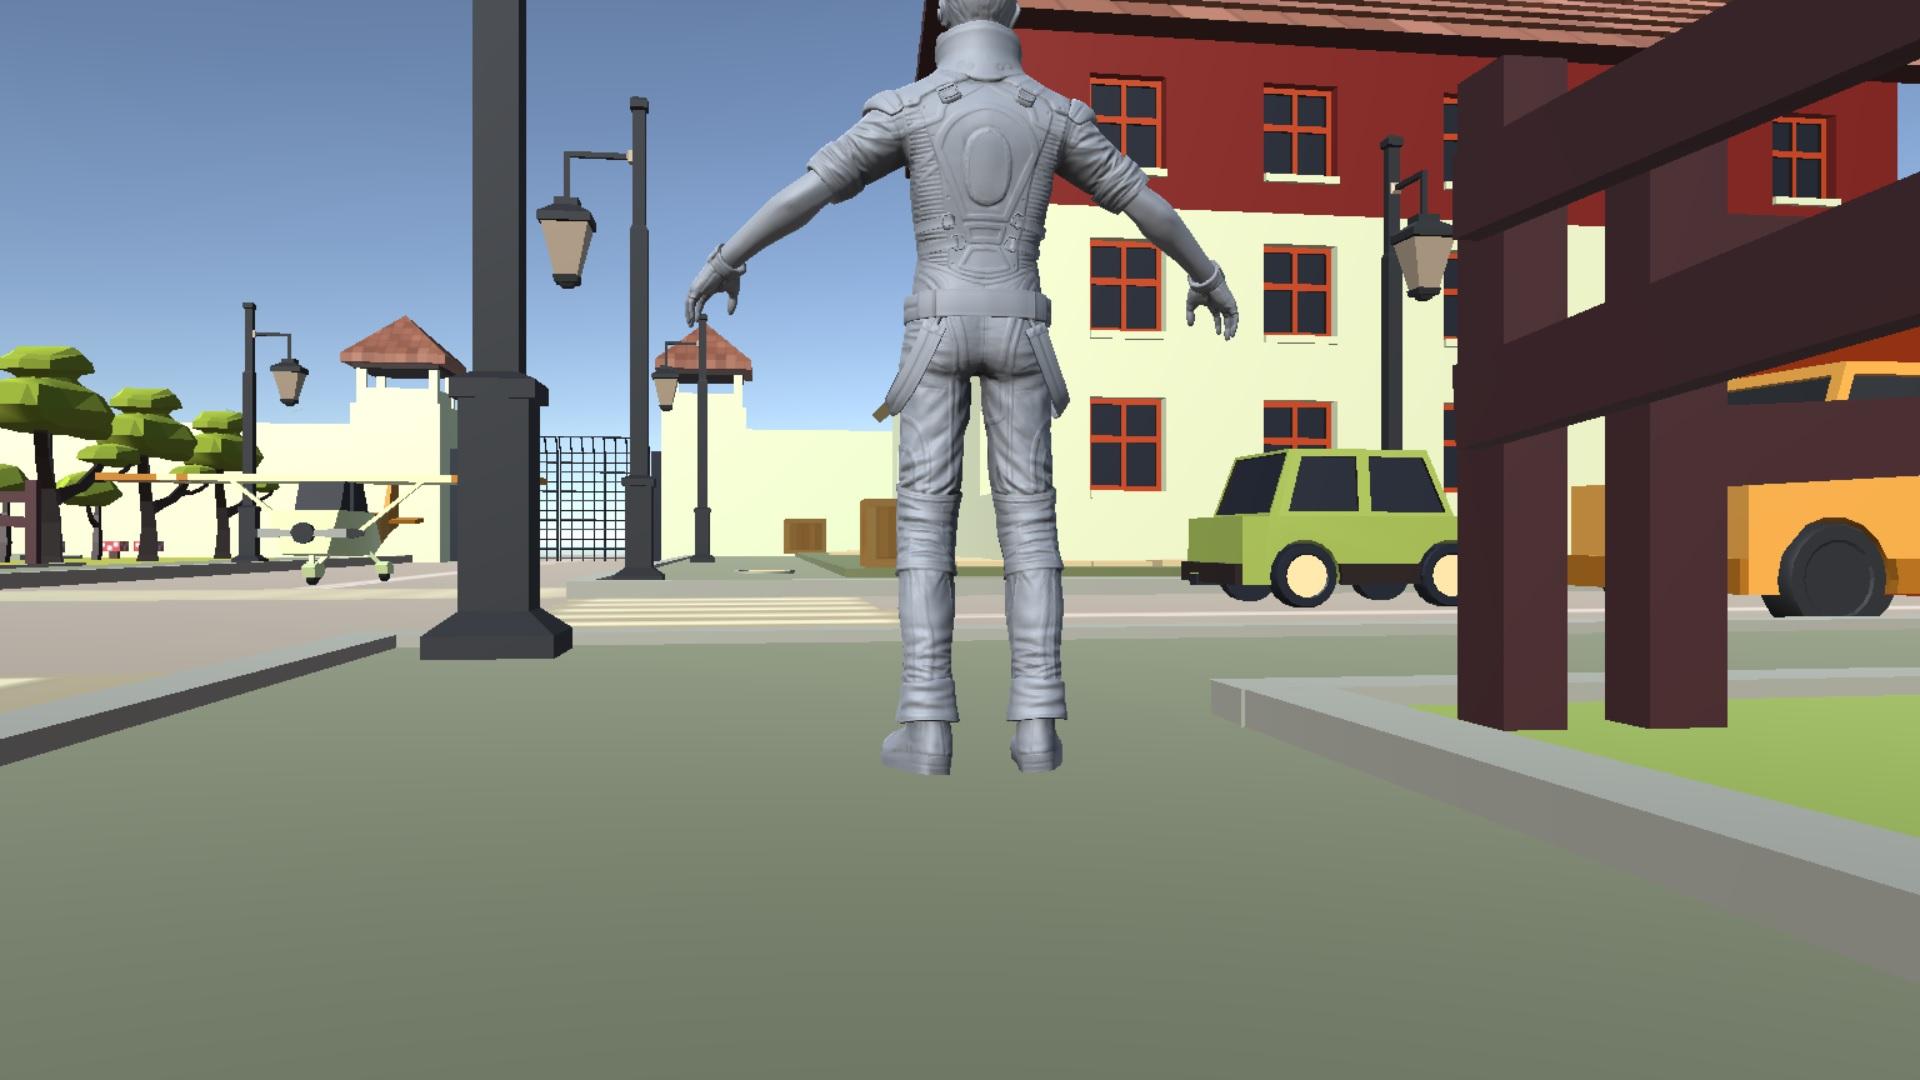 Plataformas 3D